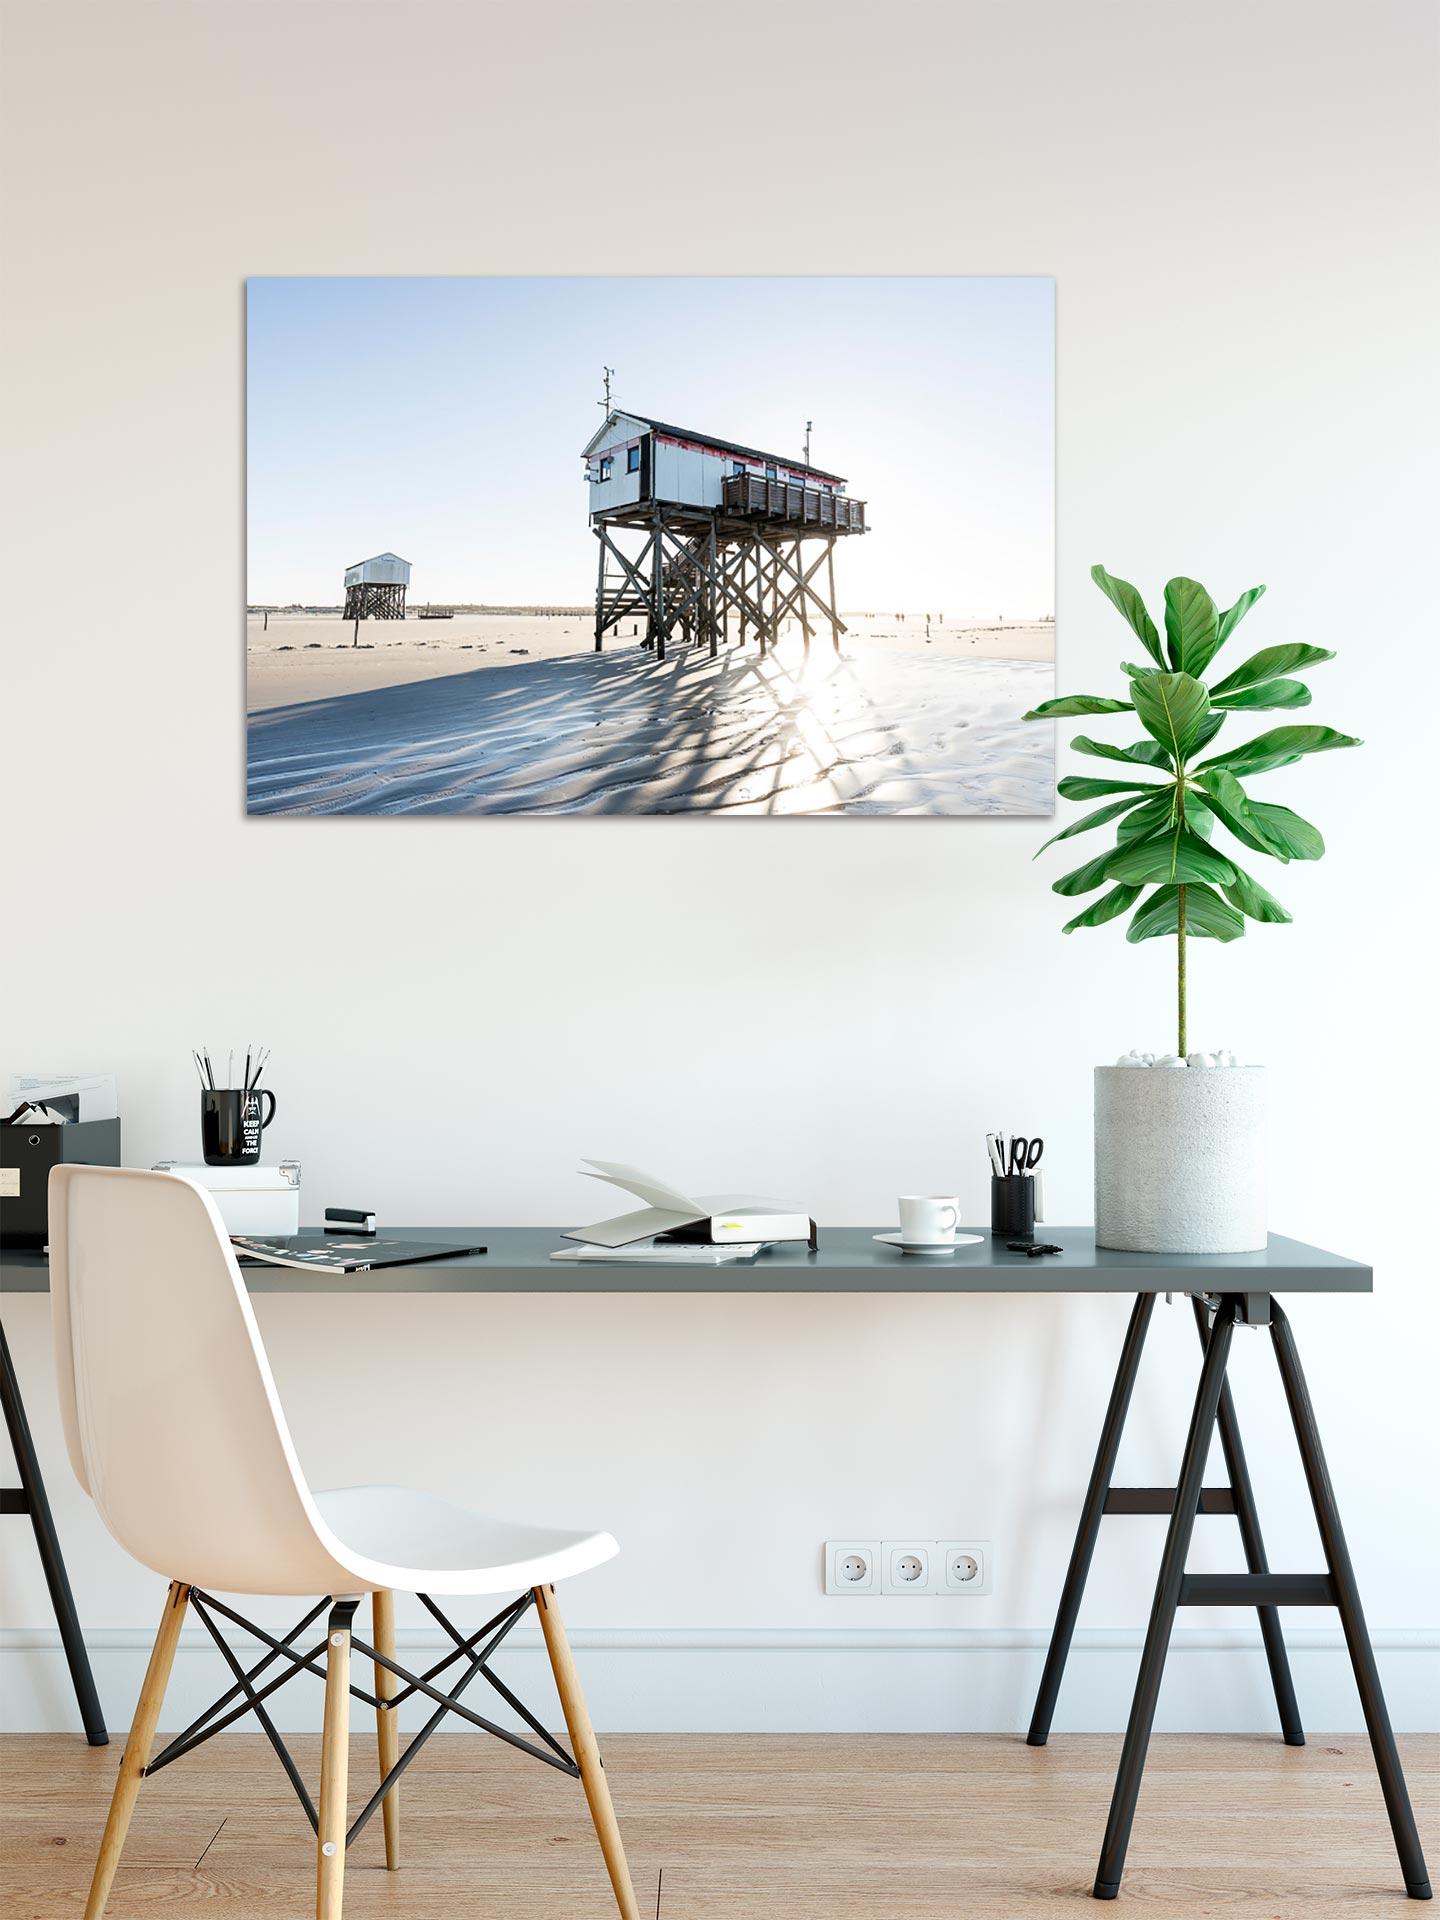 JS204-spo-4-wandbild-bild-auf-leinwand-acrylglas-aludibond-arbeitszimmer